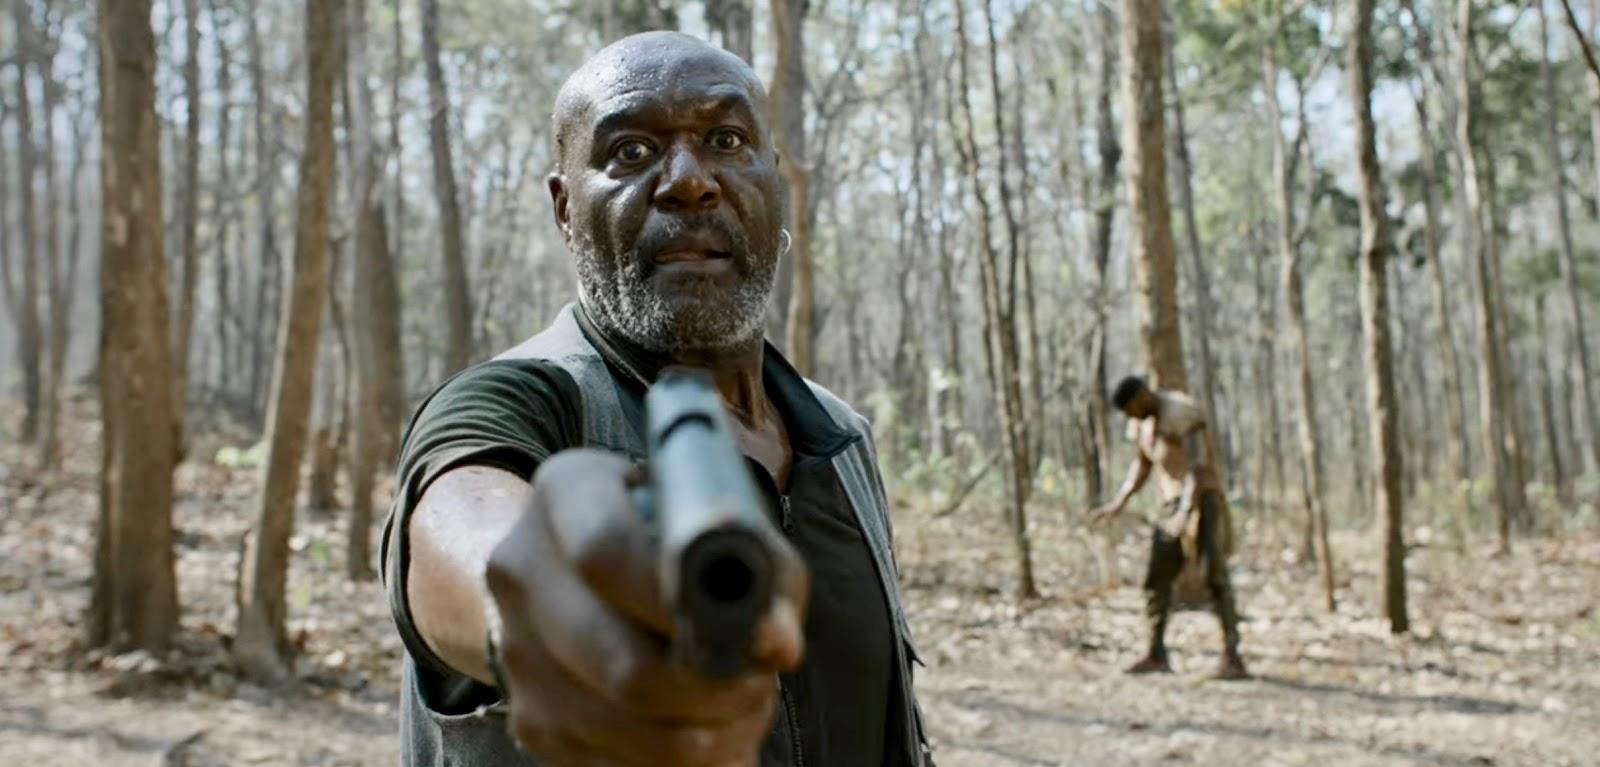 cult film freak: DELROY LINDO STARS IN 'DA 5 BLOODS' DIRECTED BY SPIKE LEE